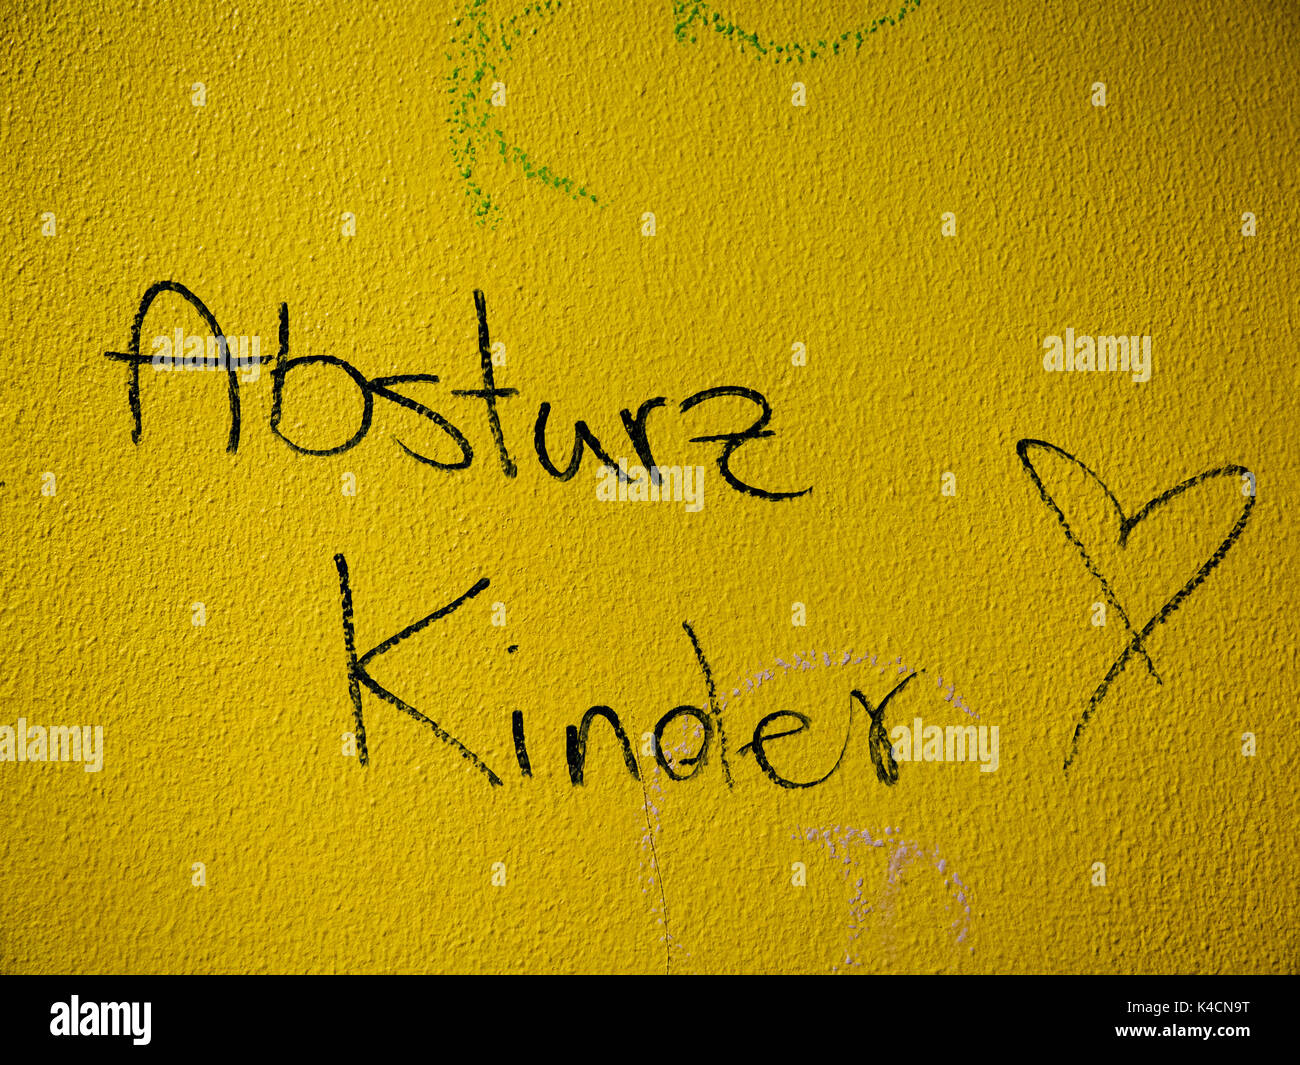 Youth Culture, Graffiti Border Society, Childhood - Stock Image